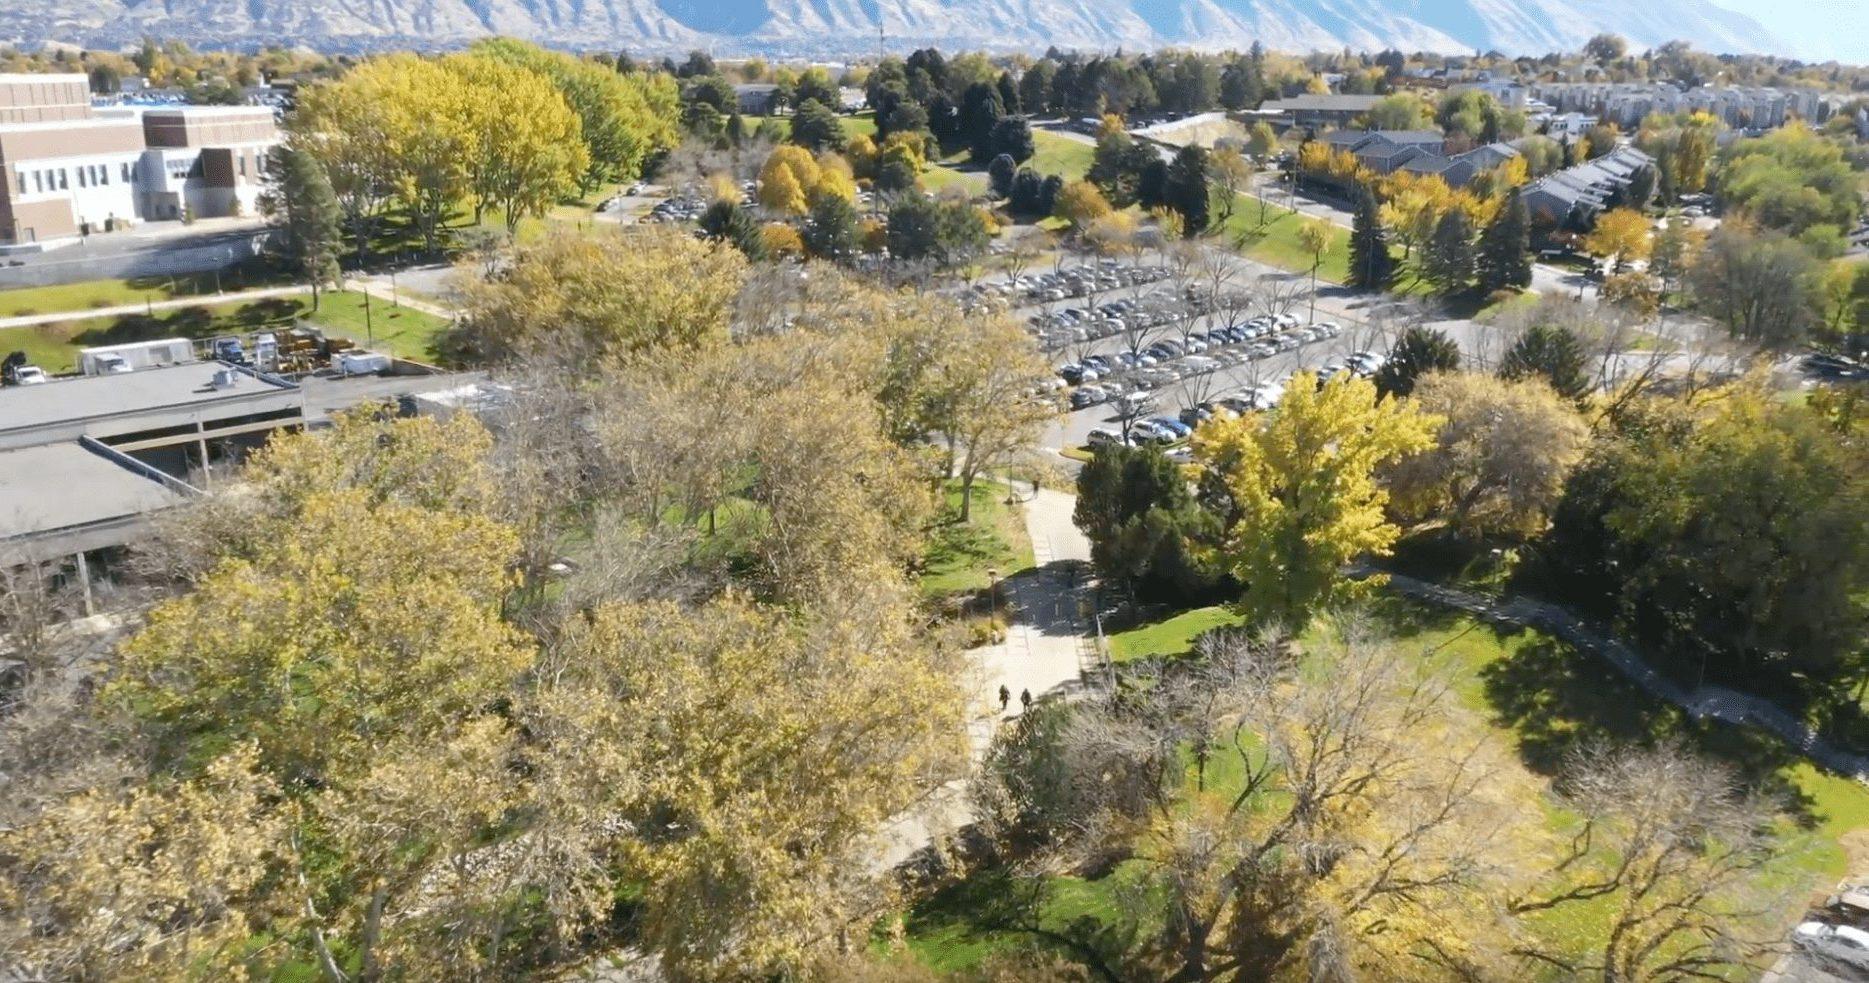 Commercial Tree Service Arbor+ Utah